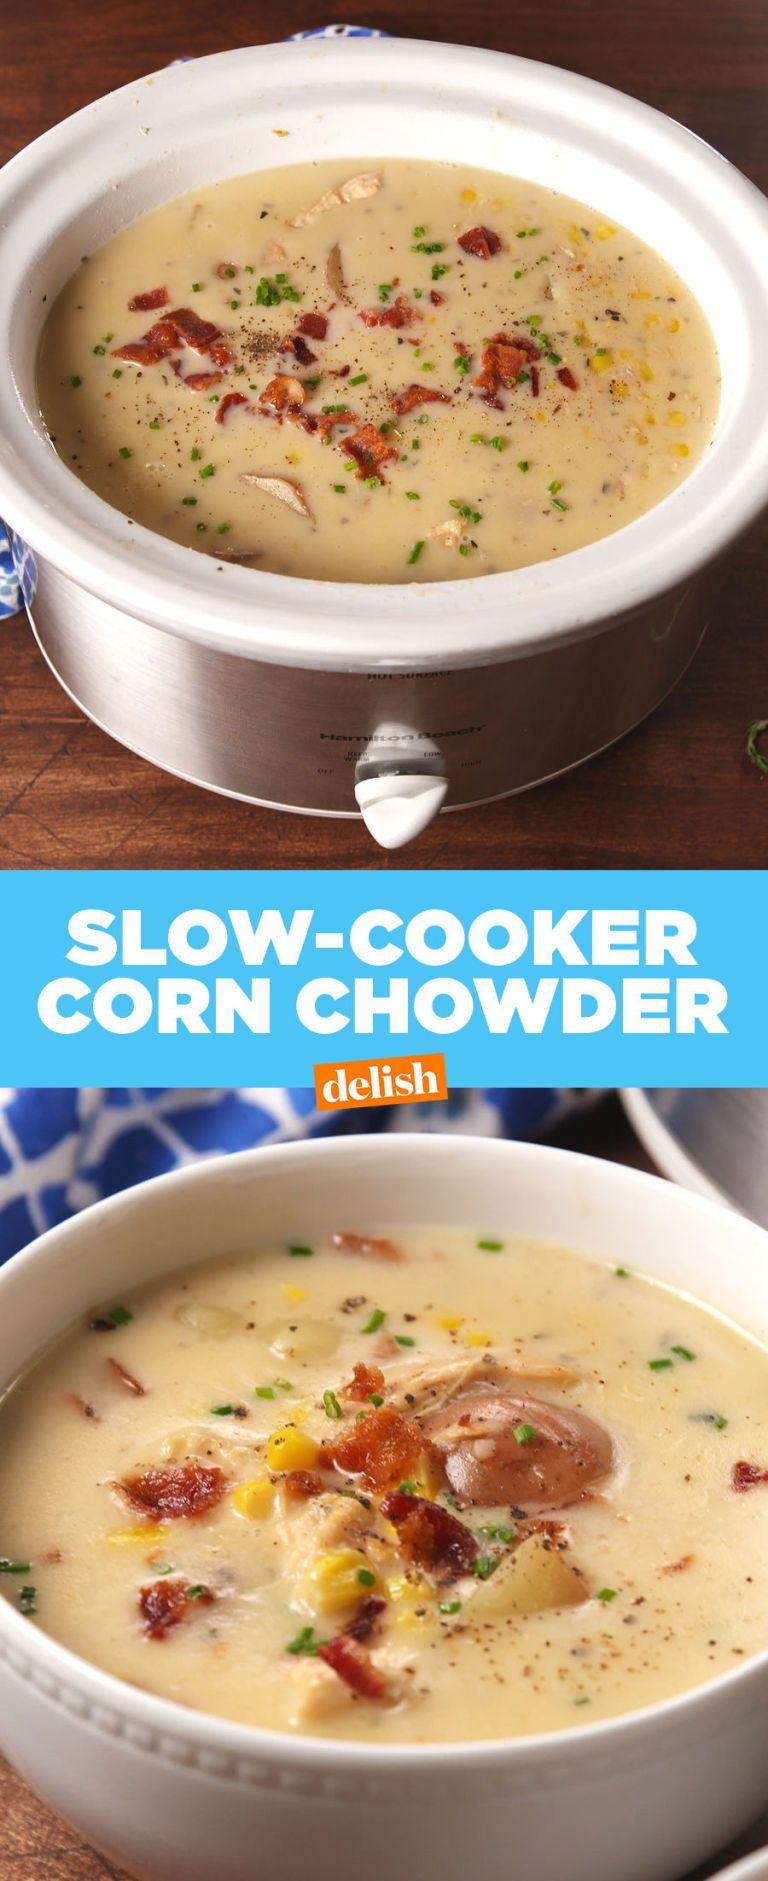 Slow Cooker Corn Chowder Recipe Food Pinterest Slow Cooker